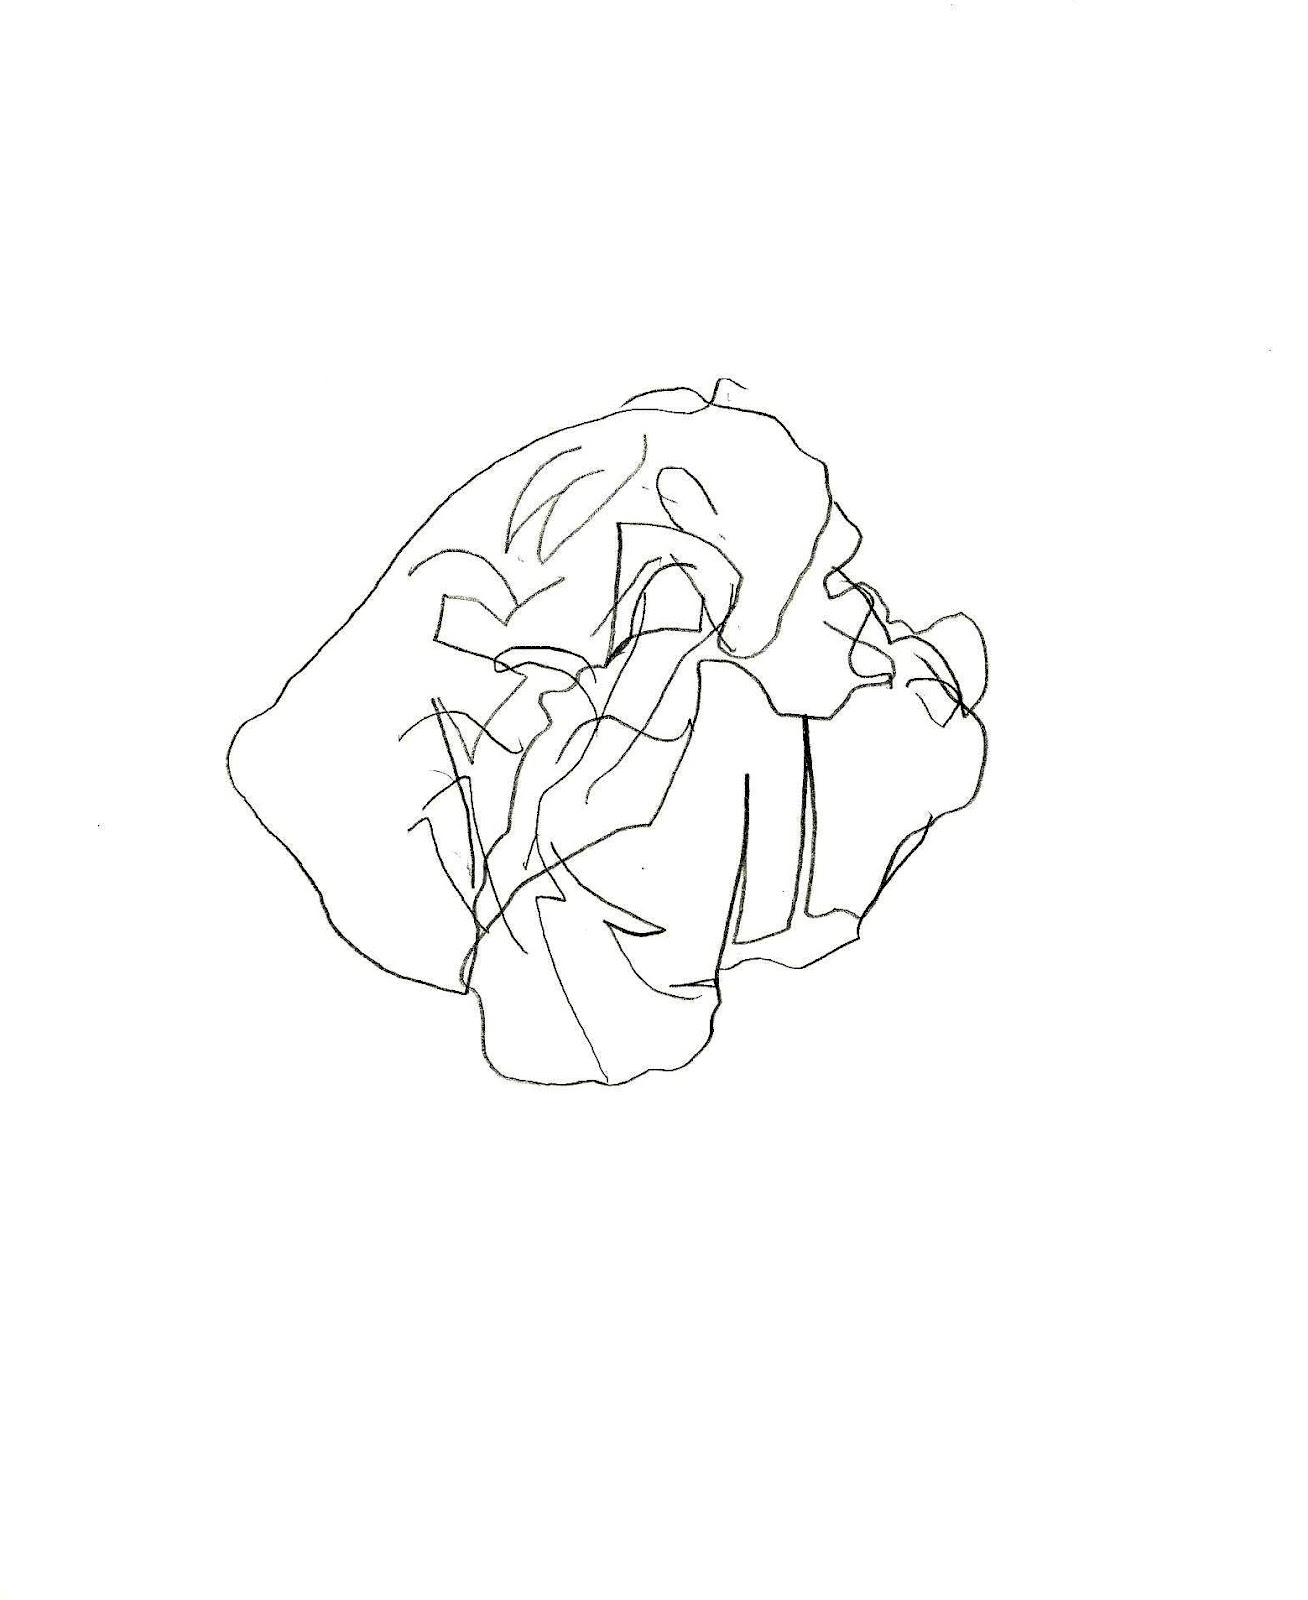 Daniela cantor betty edwars aprender a dibujar for Papel para dibujar